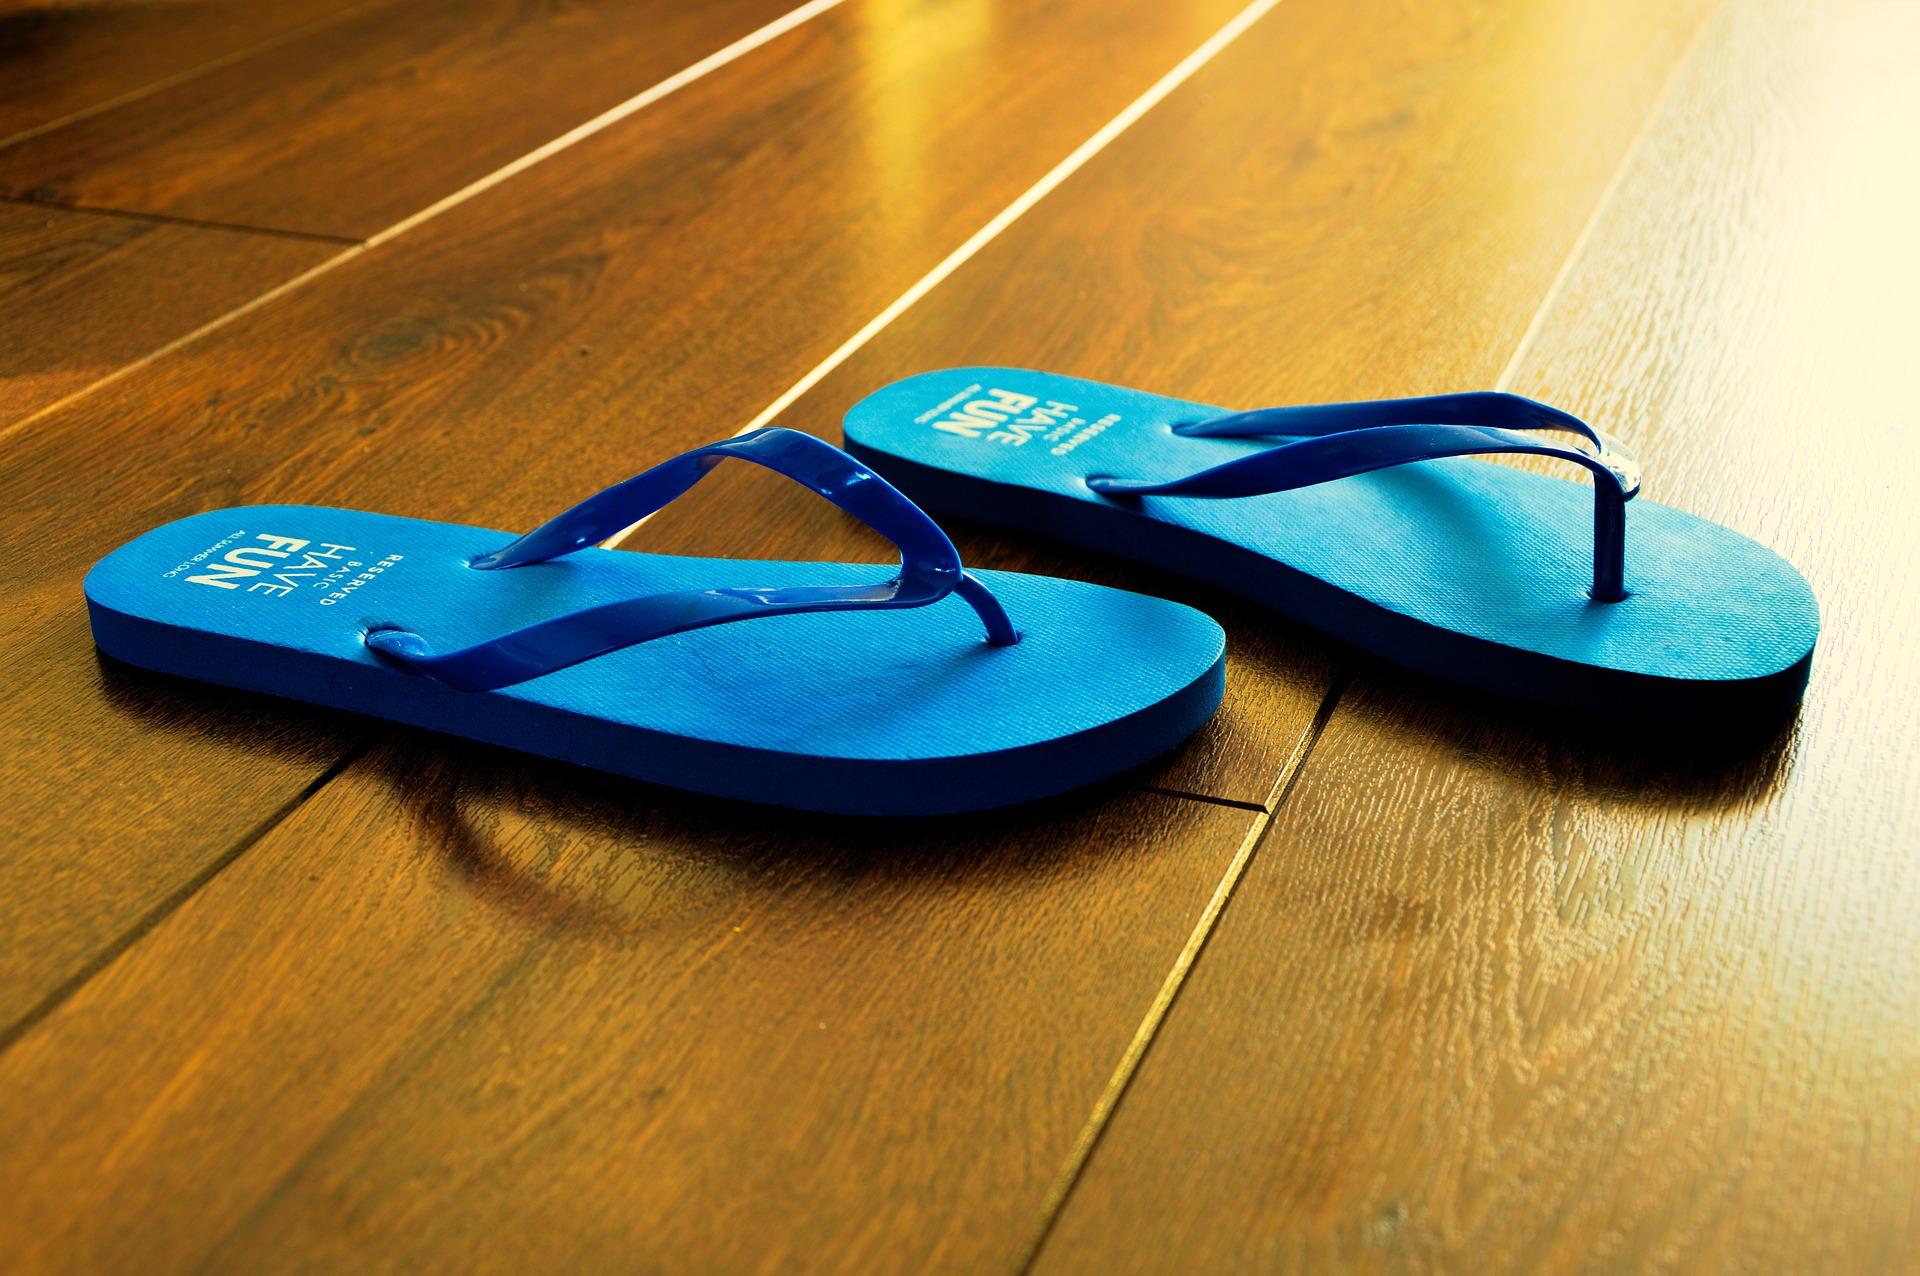 flip-flops-932699_1920.jpg